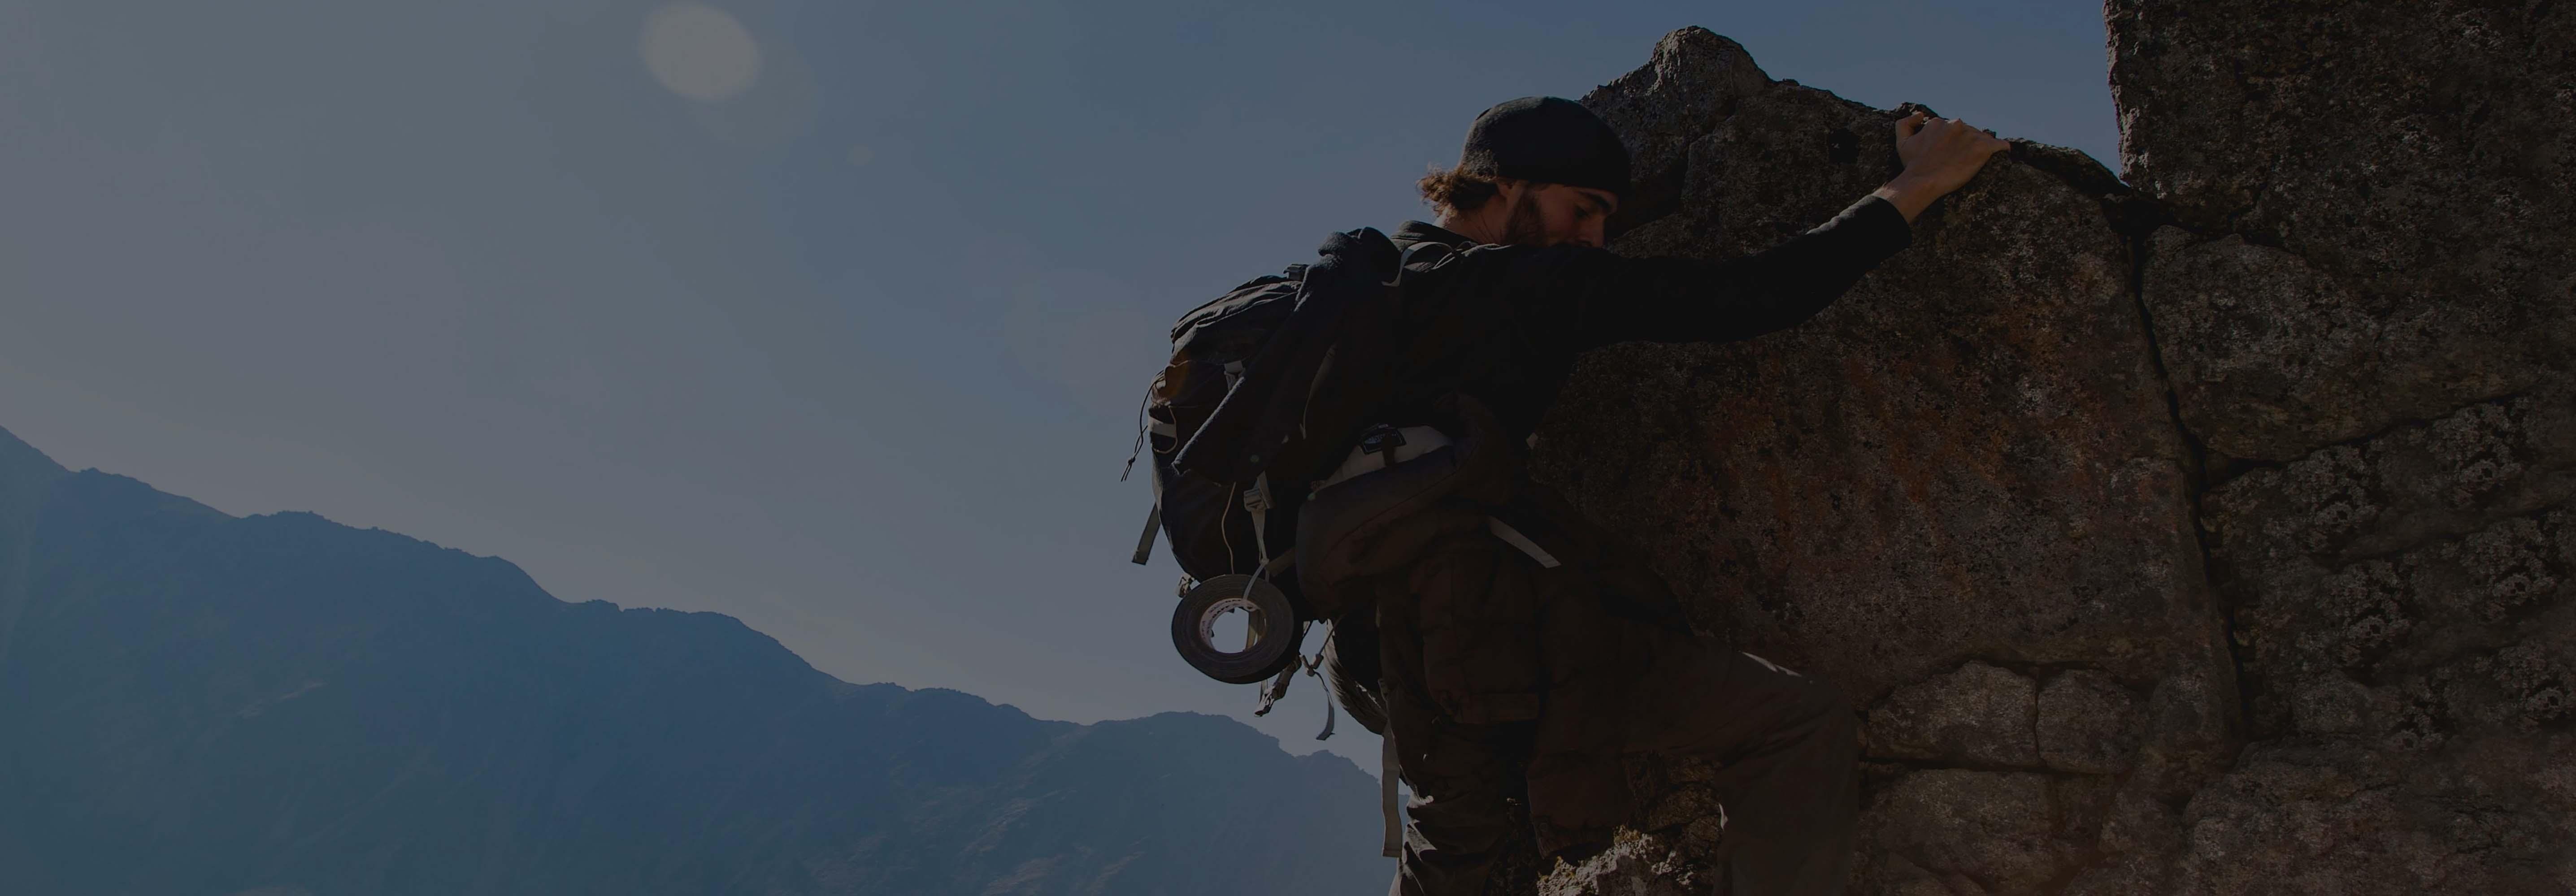 Kletterrucksack outdoor-rucksack.com